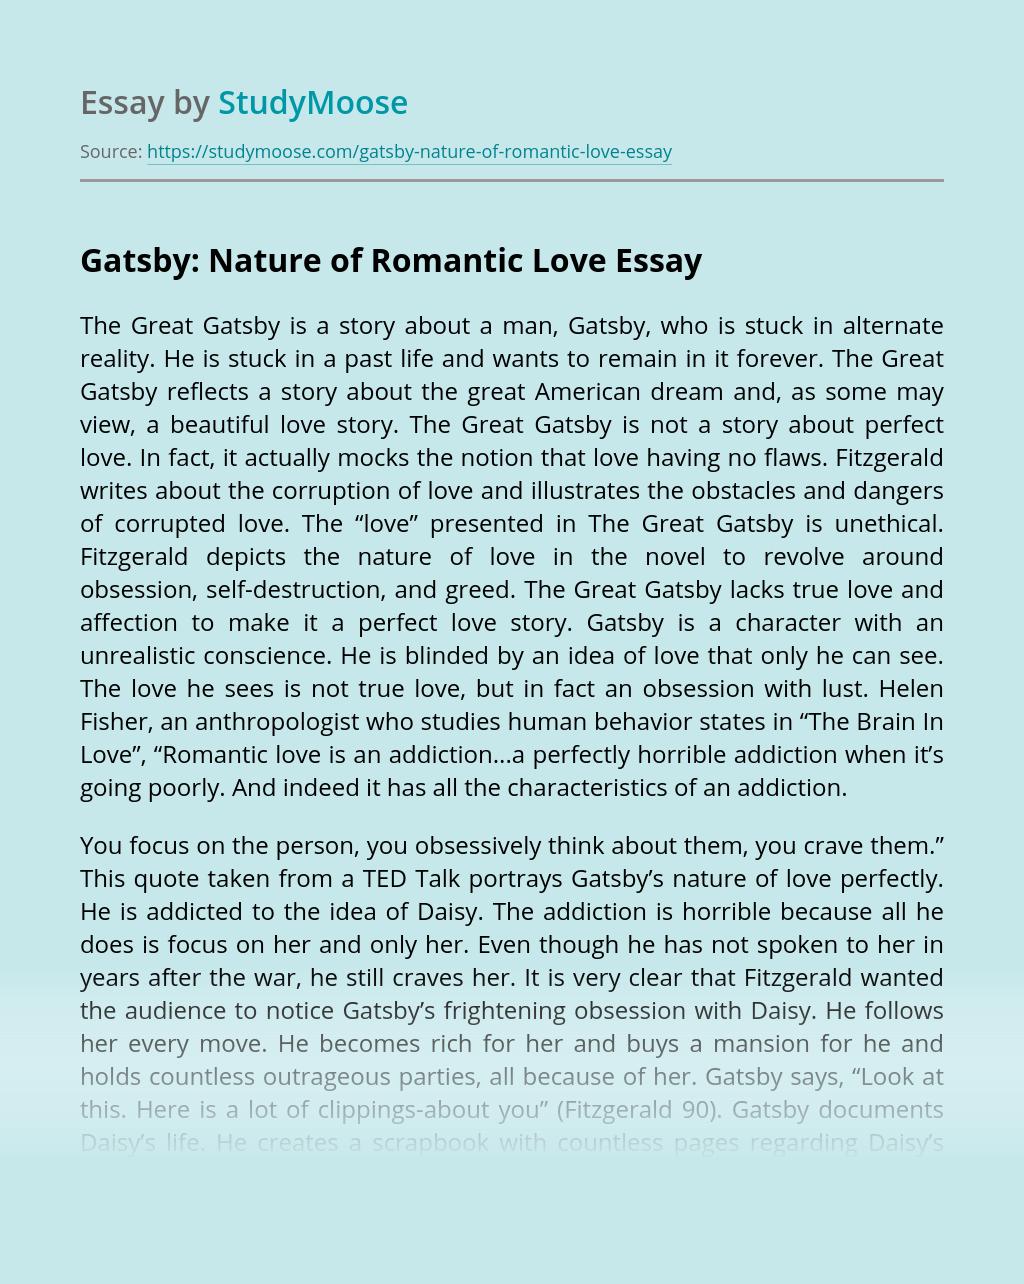 Gatsby: Nature of Romantic Love